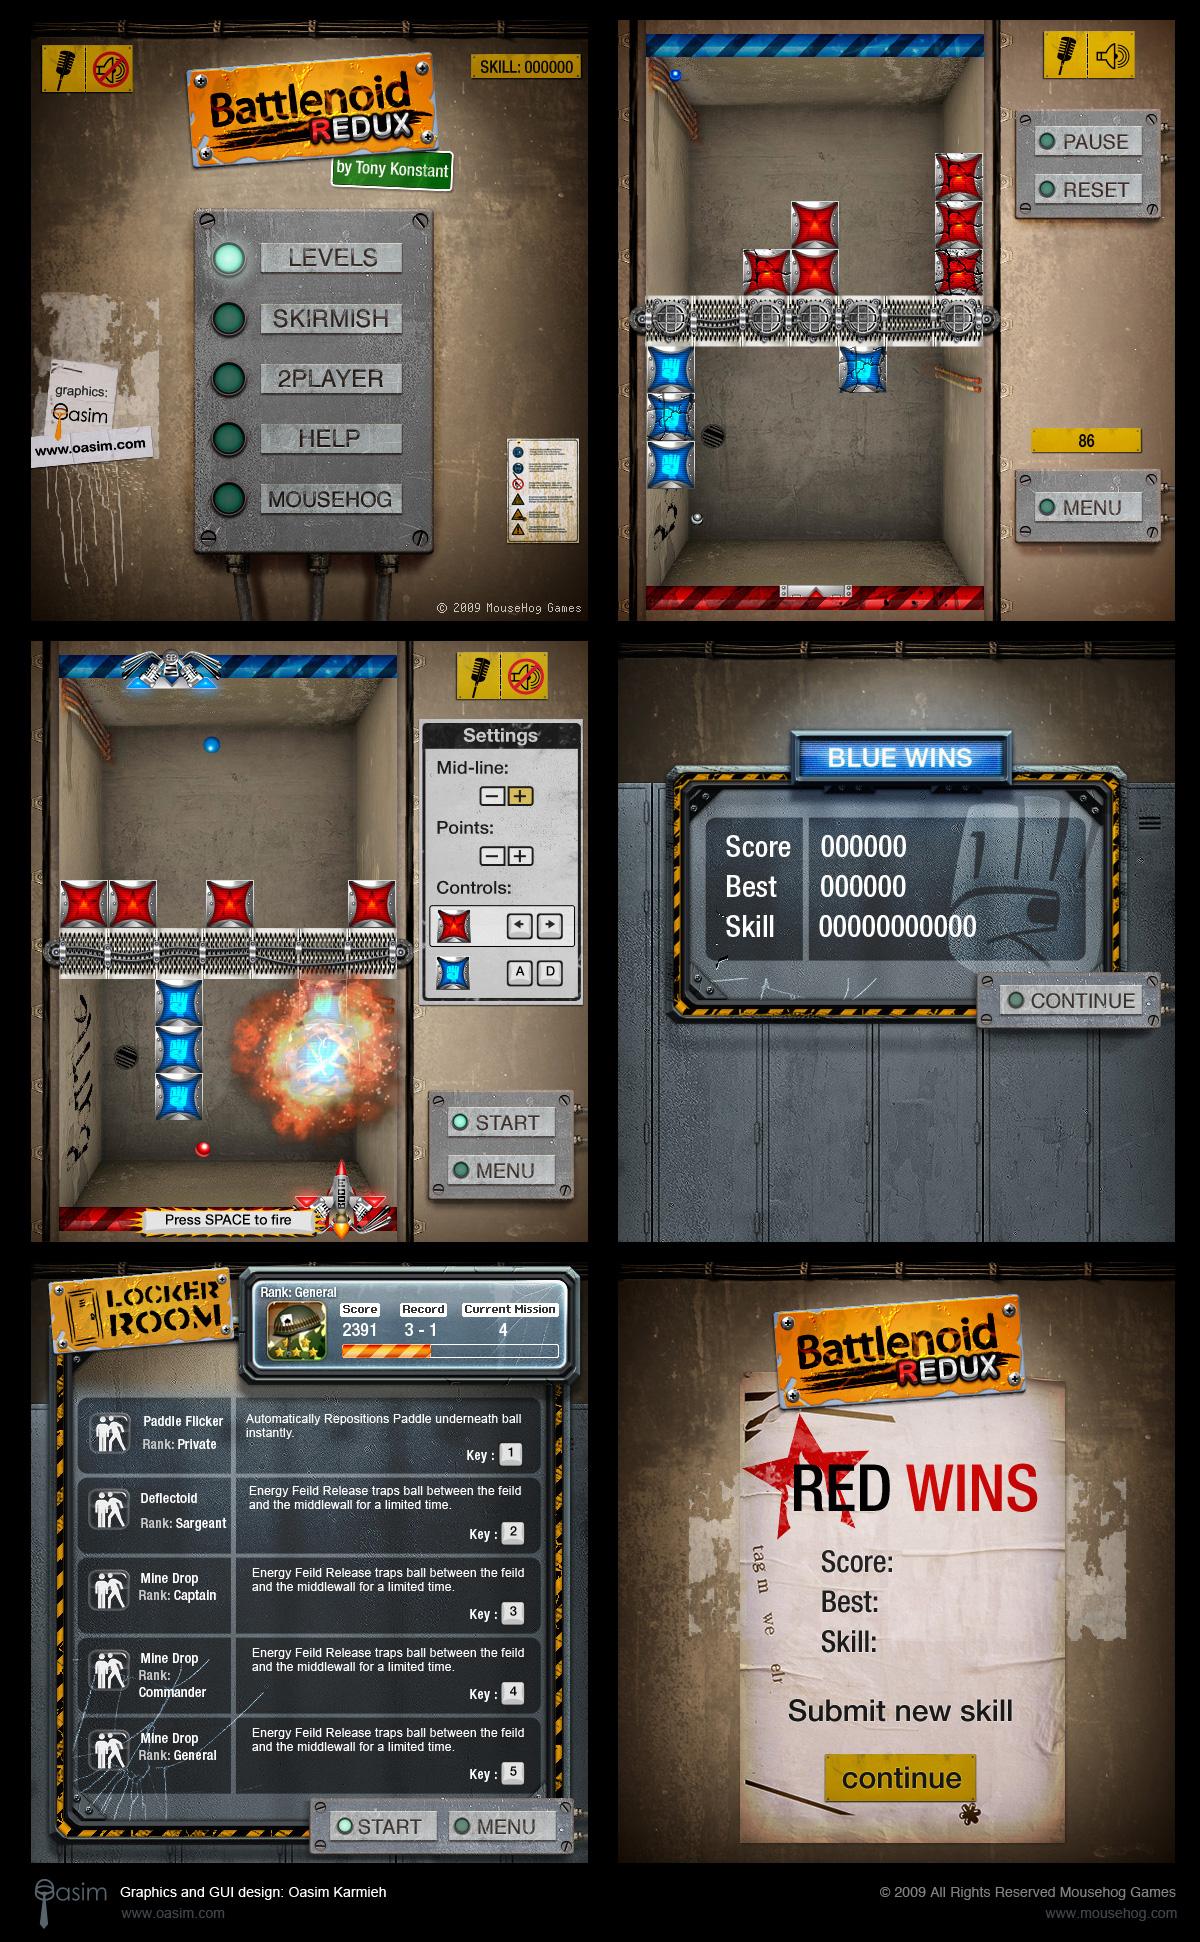 Battlenoid GUI